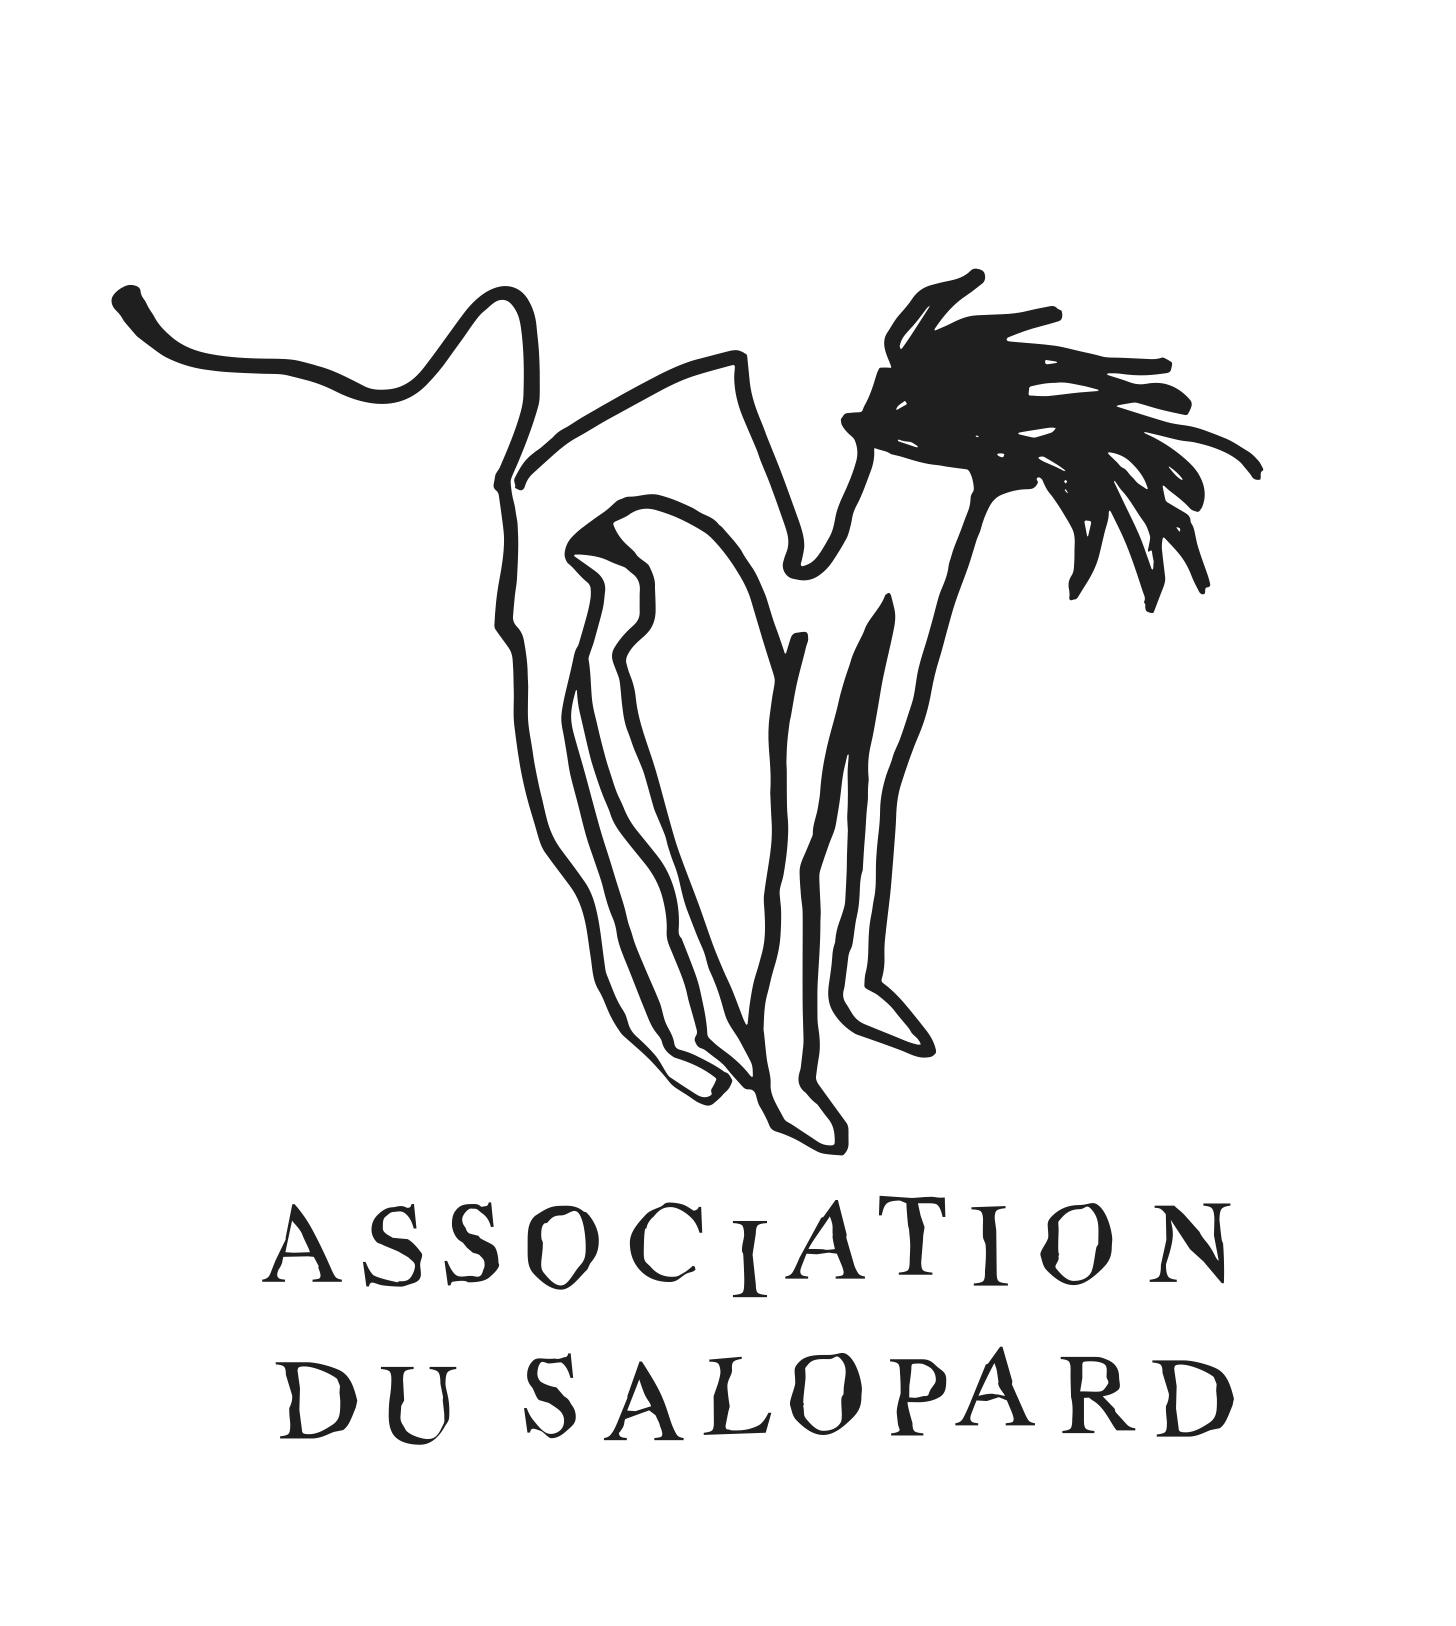 Association_du_Salopard_logo_2.png